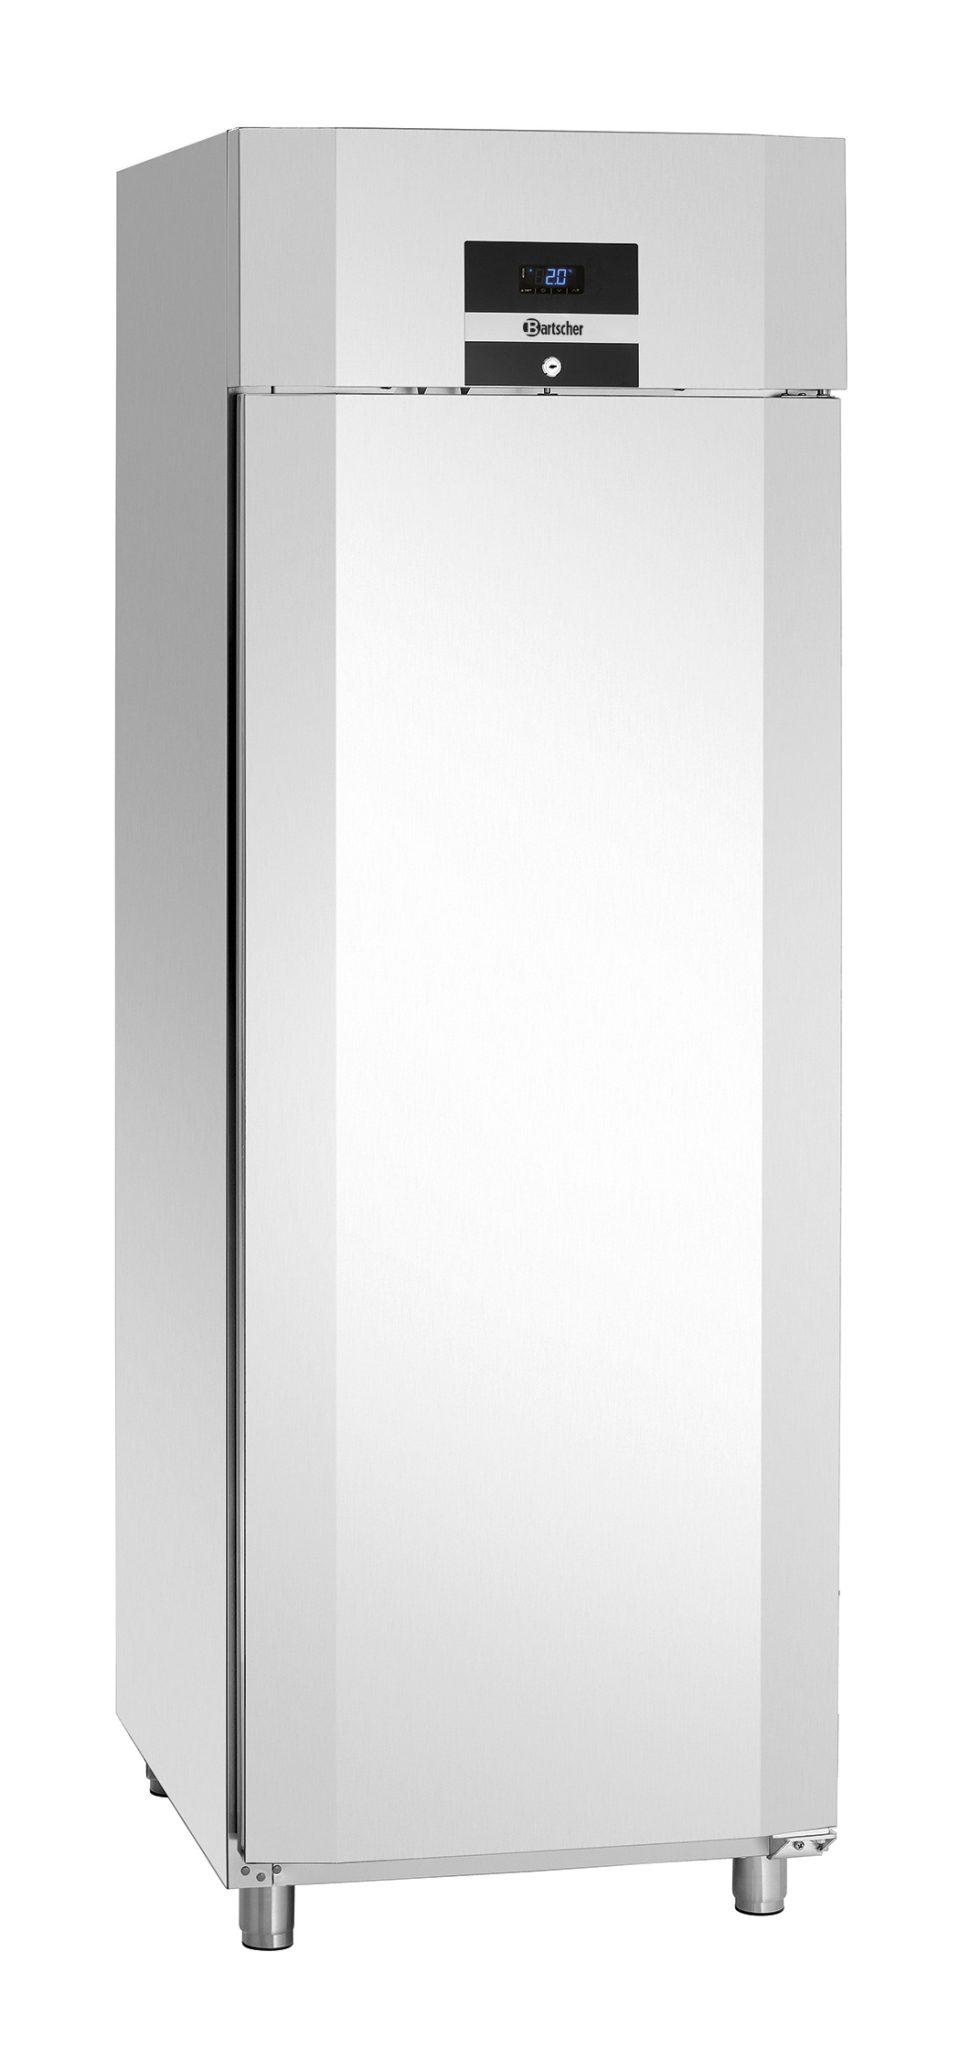 Bartscher Koelkast GN210 - 700 liter - Zilver